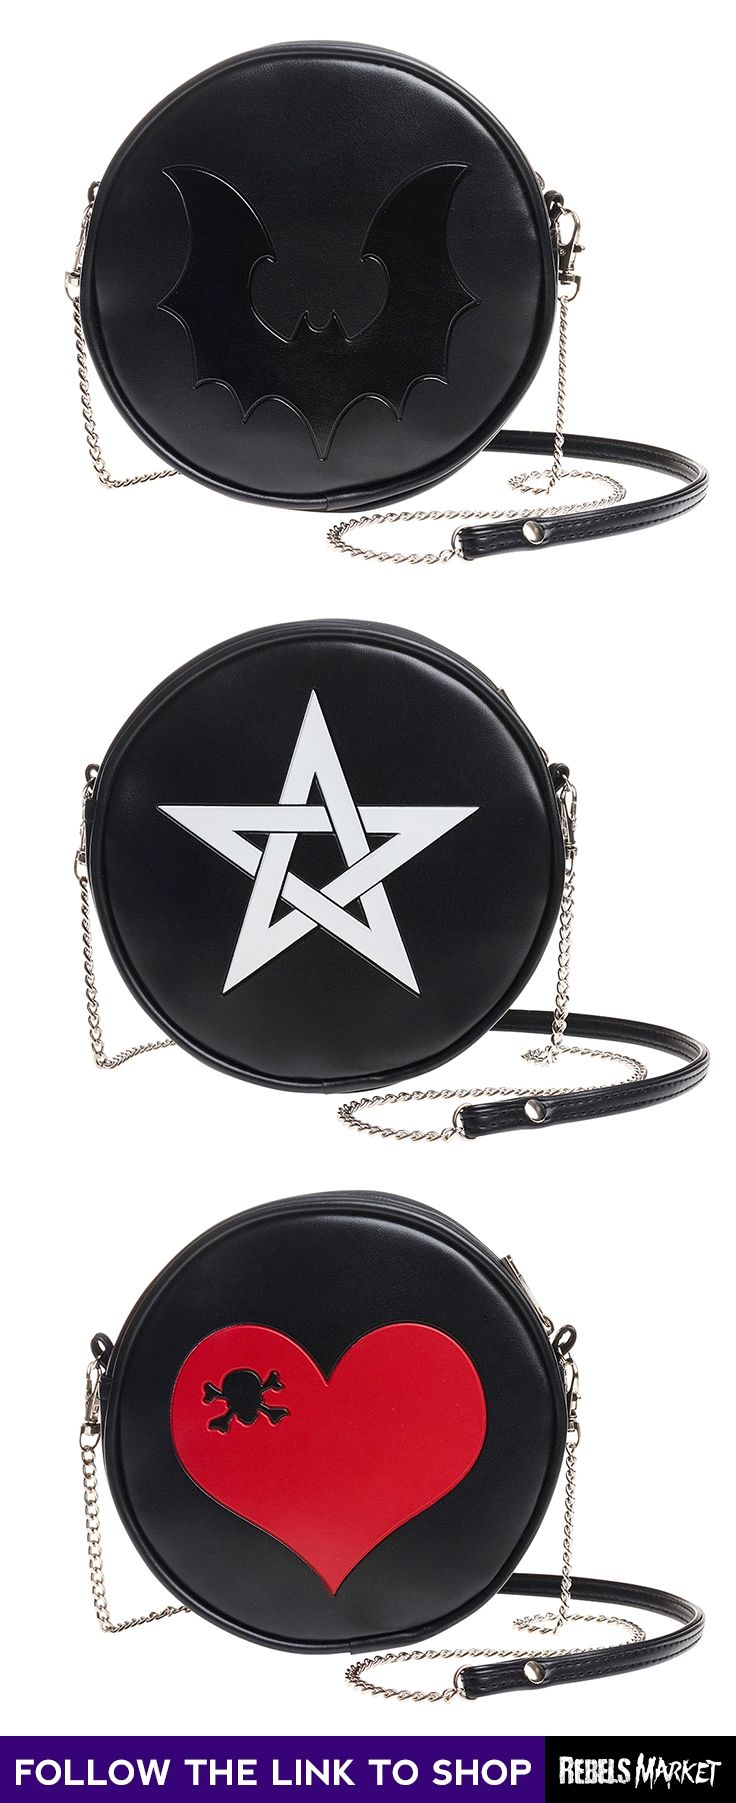 Shop gothic bags online at RebelsMarket.